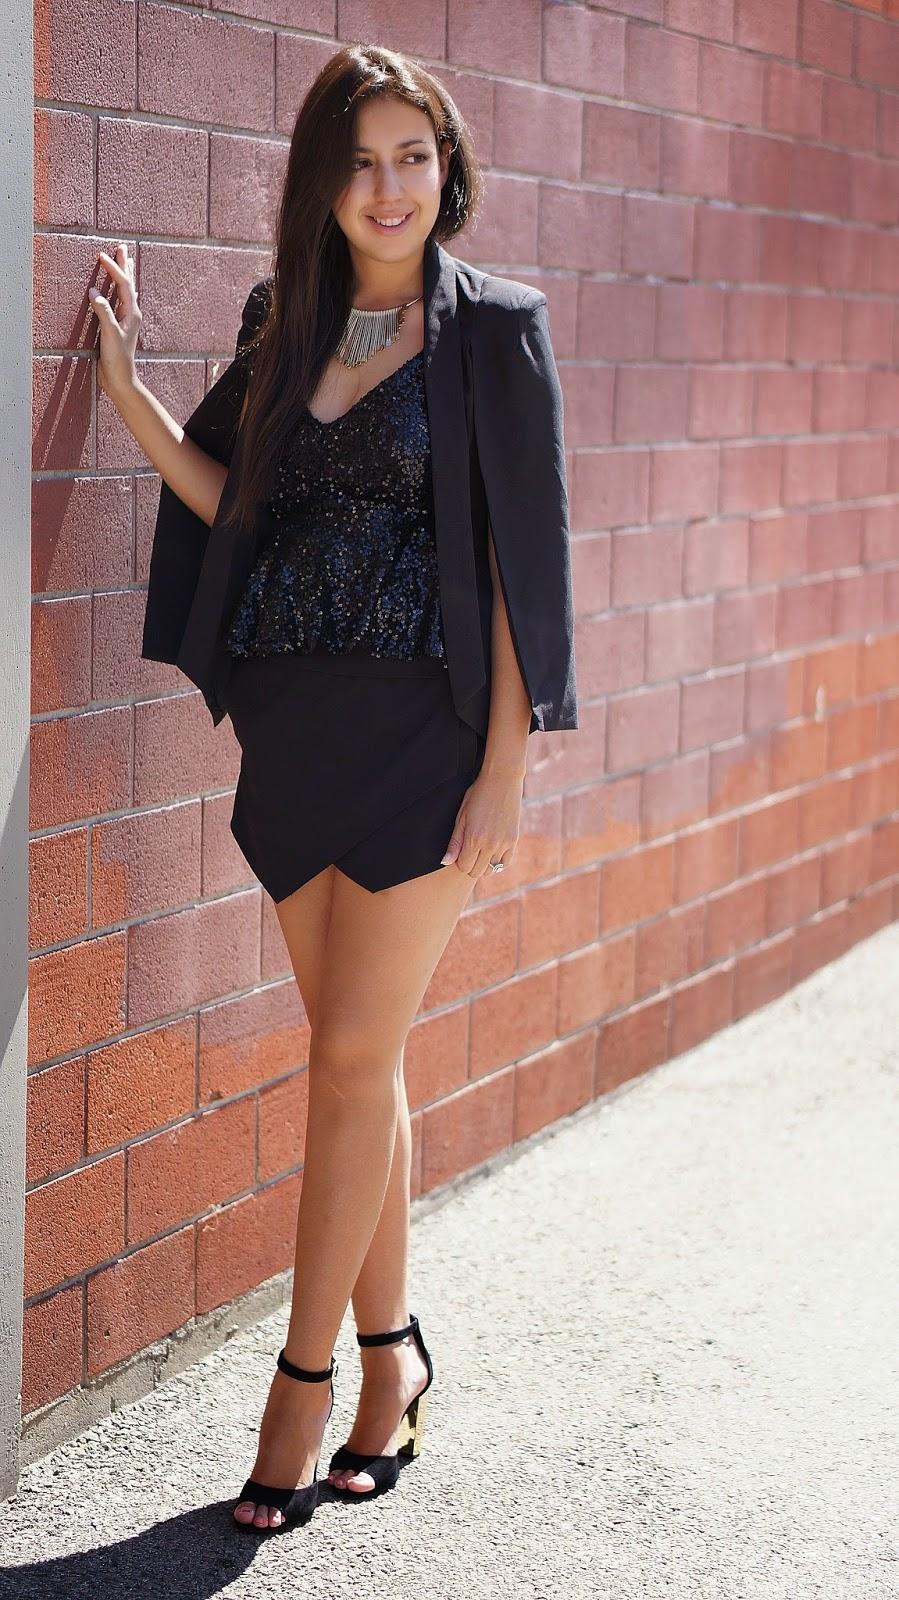 Sheinside black cape, Penny Shoemint Heels, Express Skort